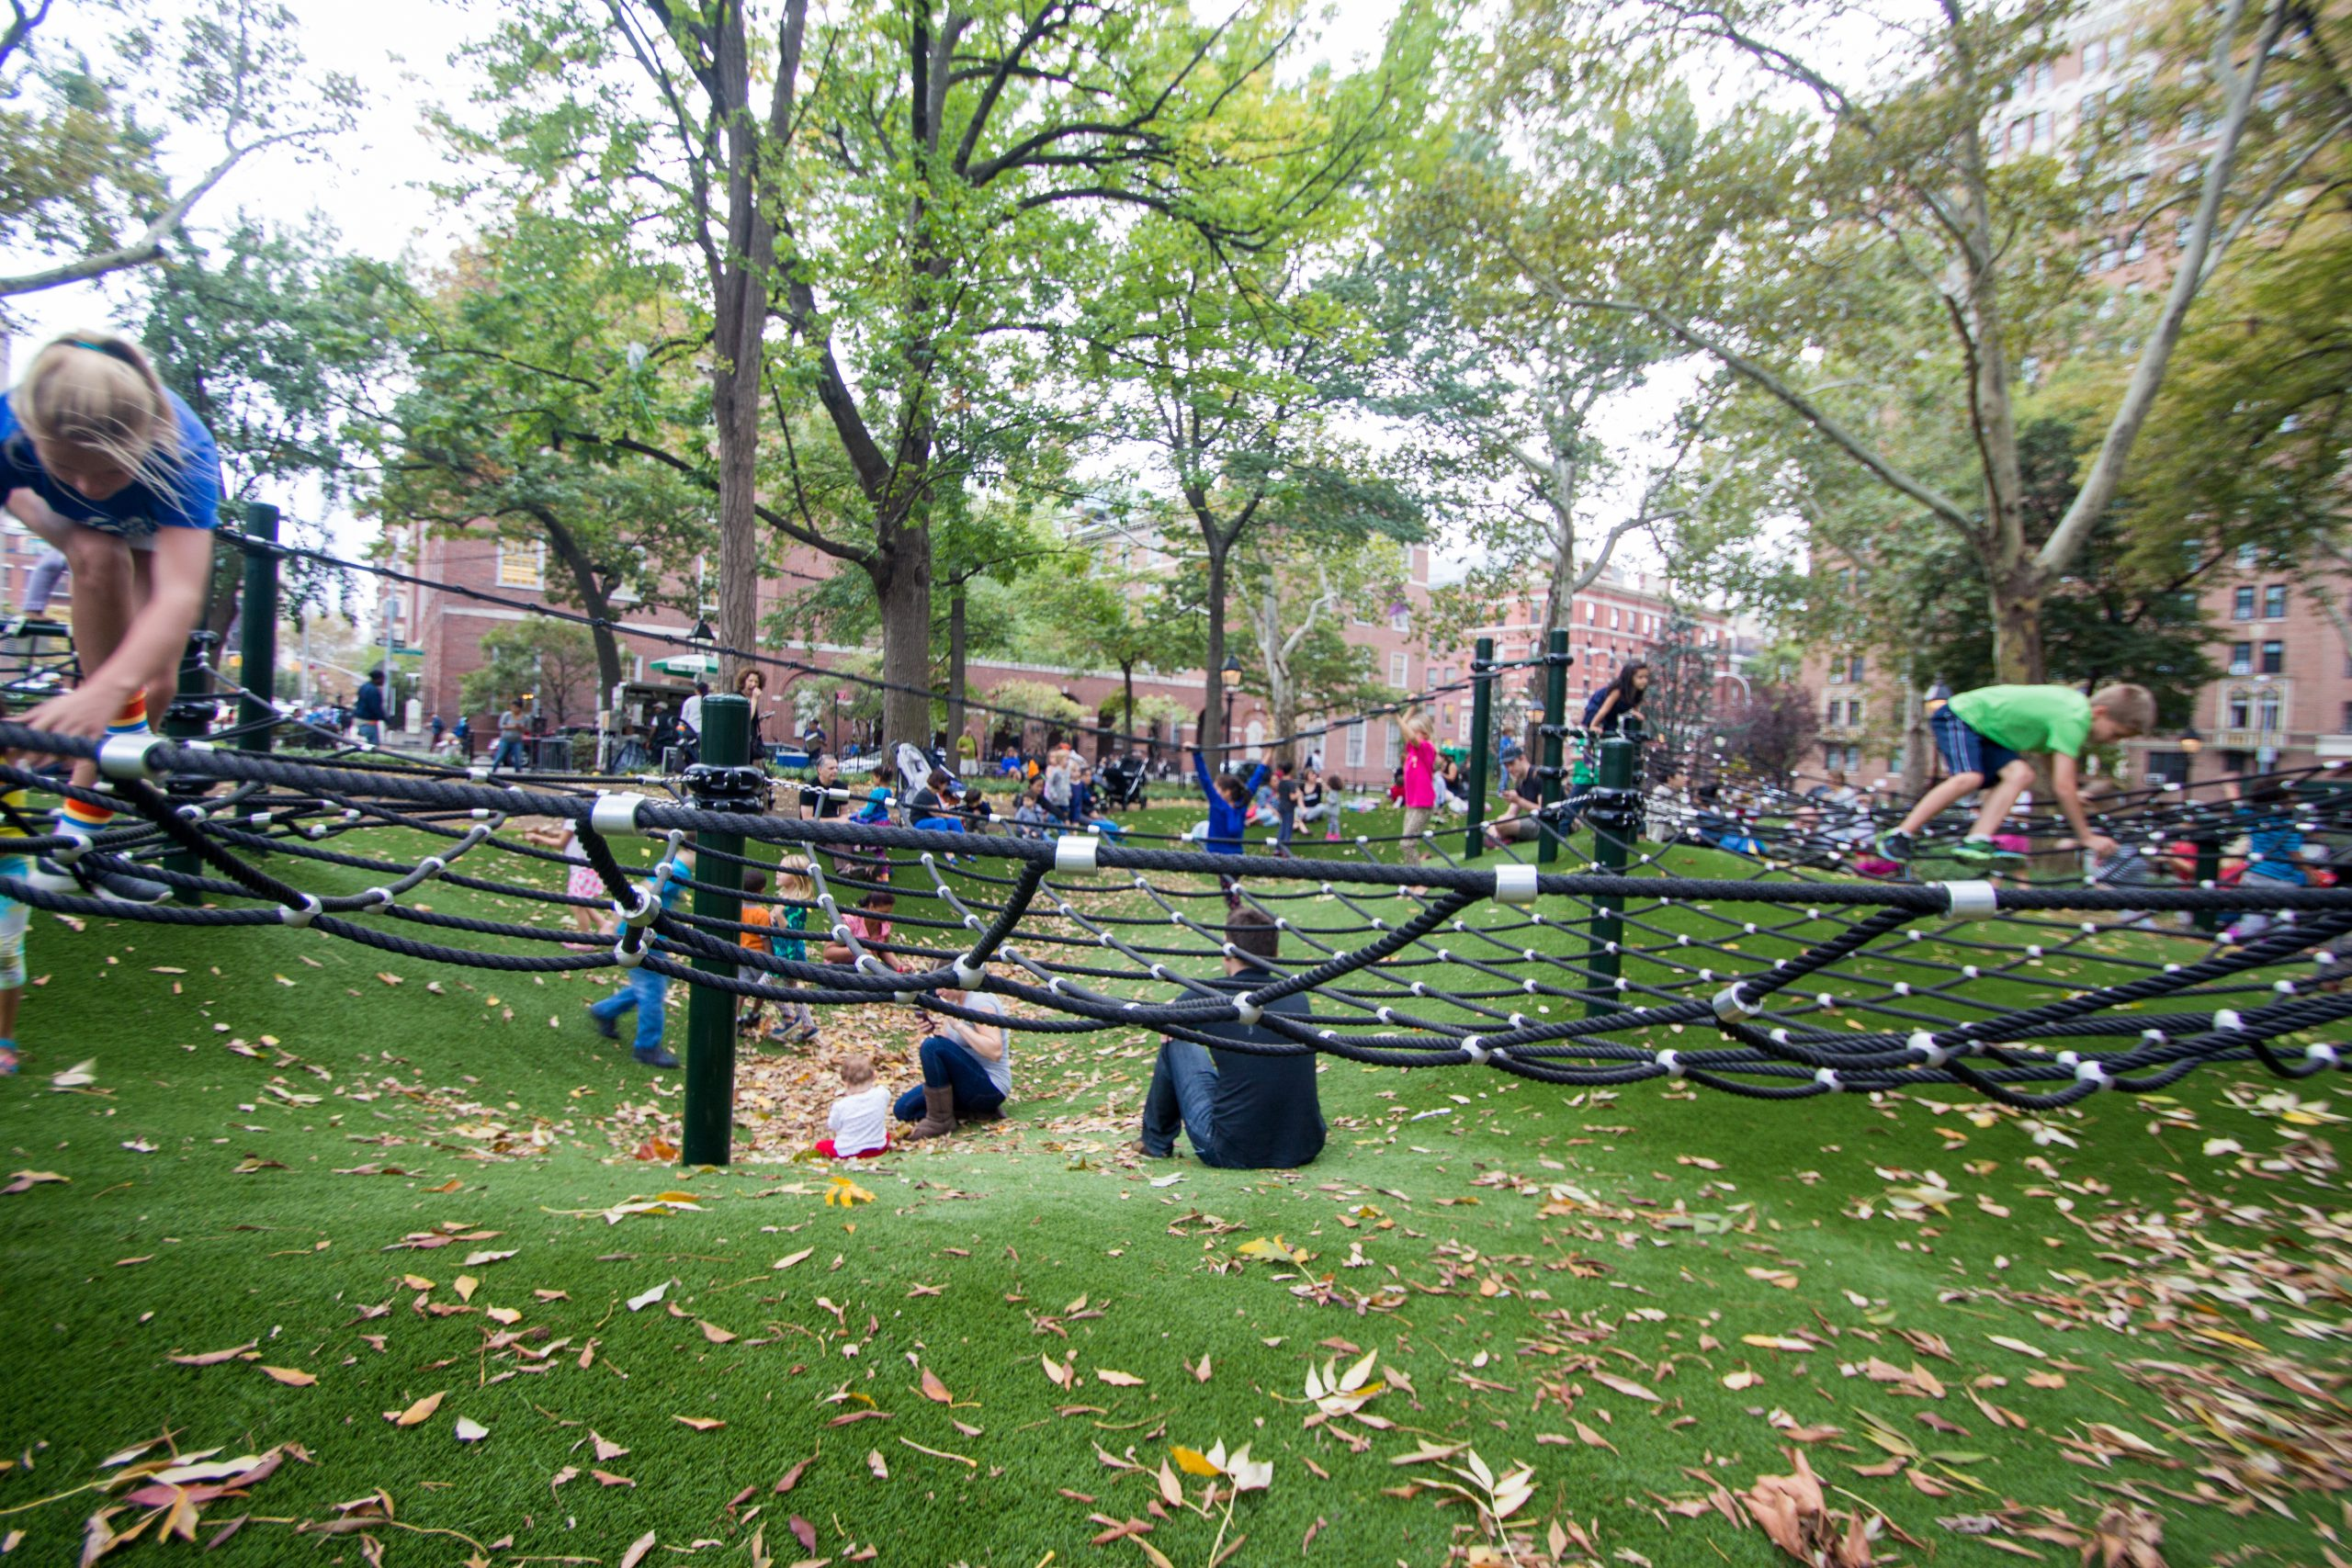 artificial grass, playground